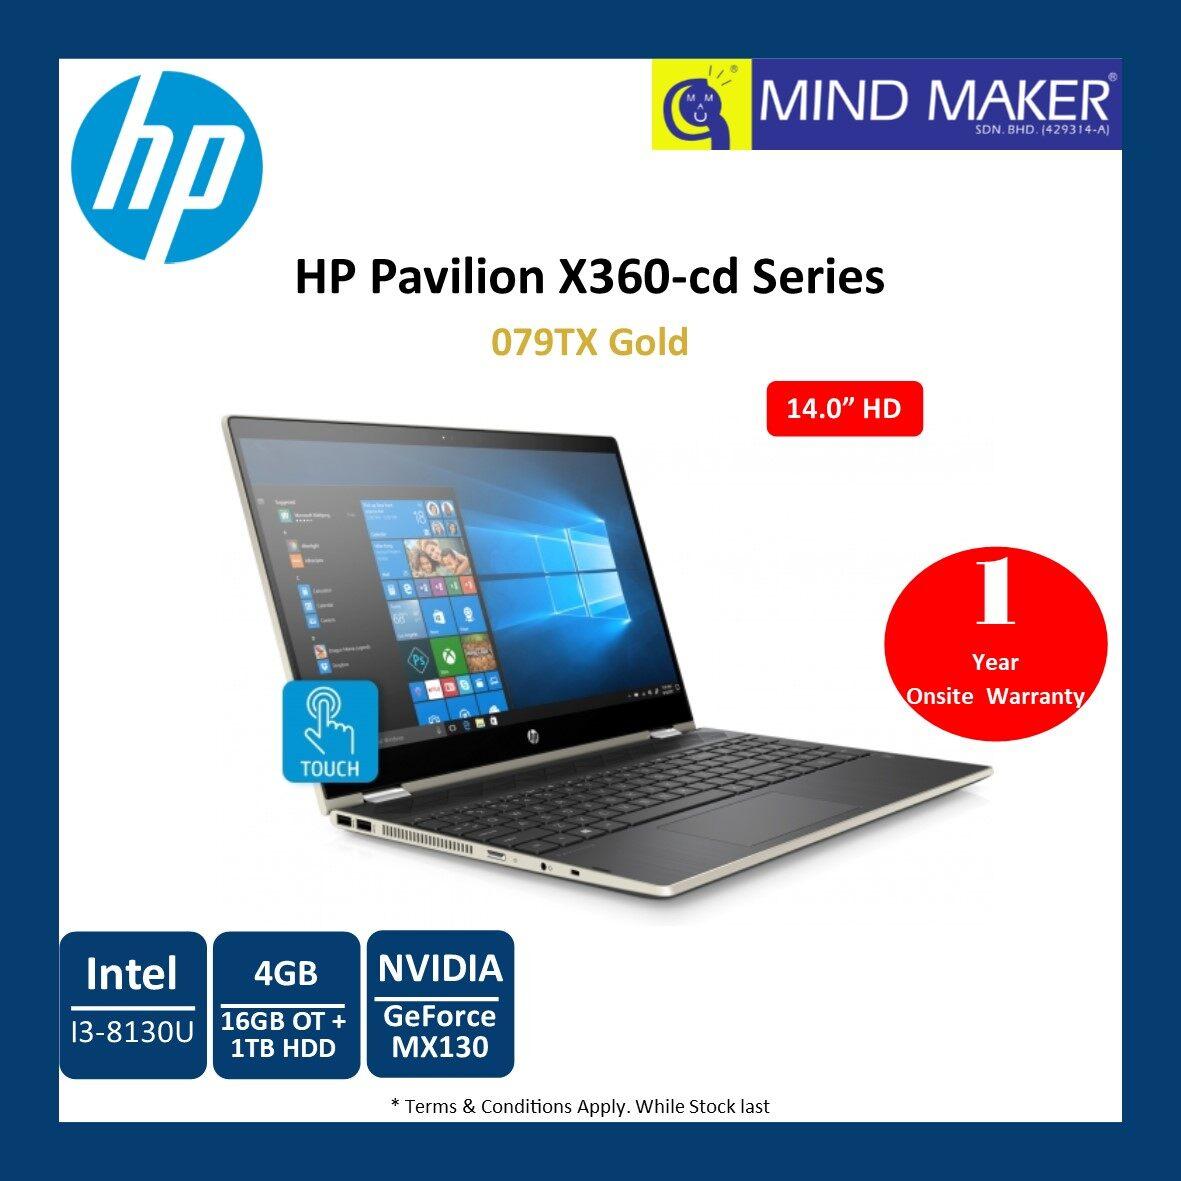 HP Pavilion X360-cd079TX Gold 14.0  HD Laptop (Intel i3-8130U/ 4GB RAM/ 16GB Optane Memory + 1TB HDD/ NVIDIA GeForce MX130/ 2 Years Warranty) Malaysia